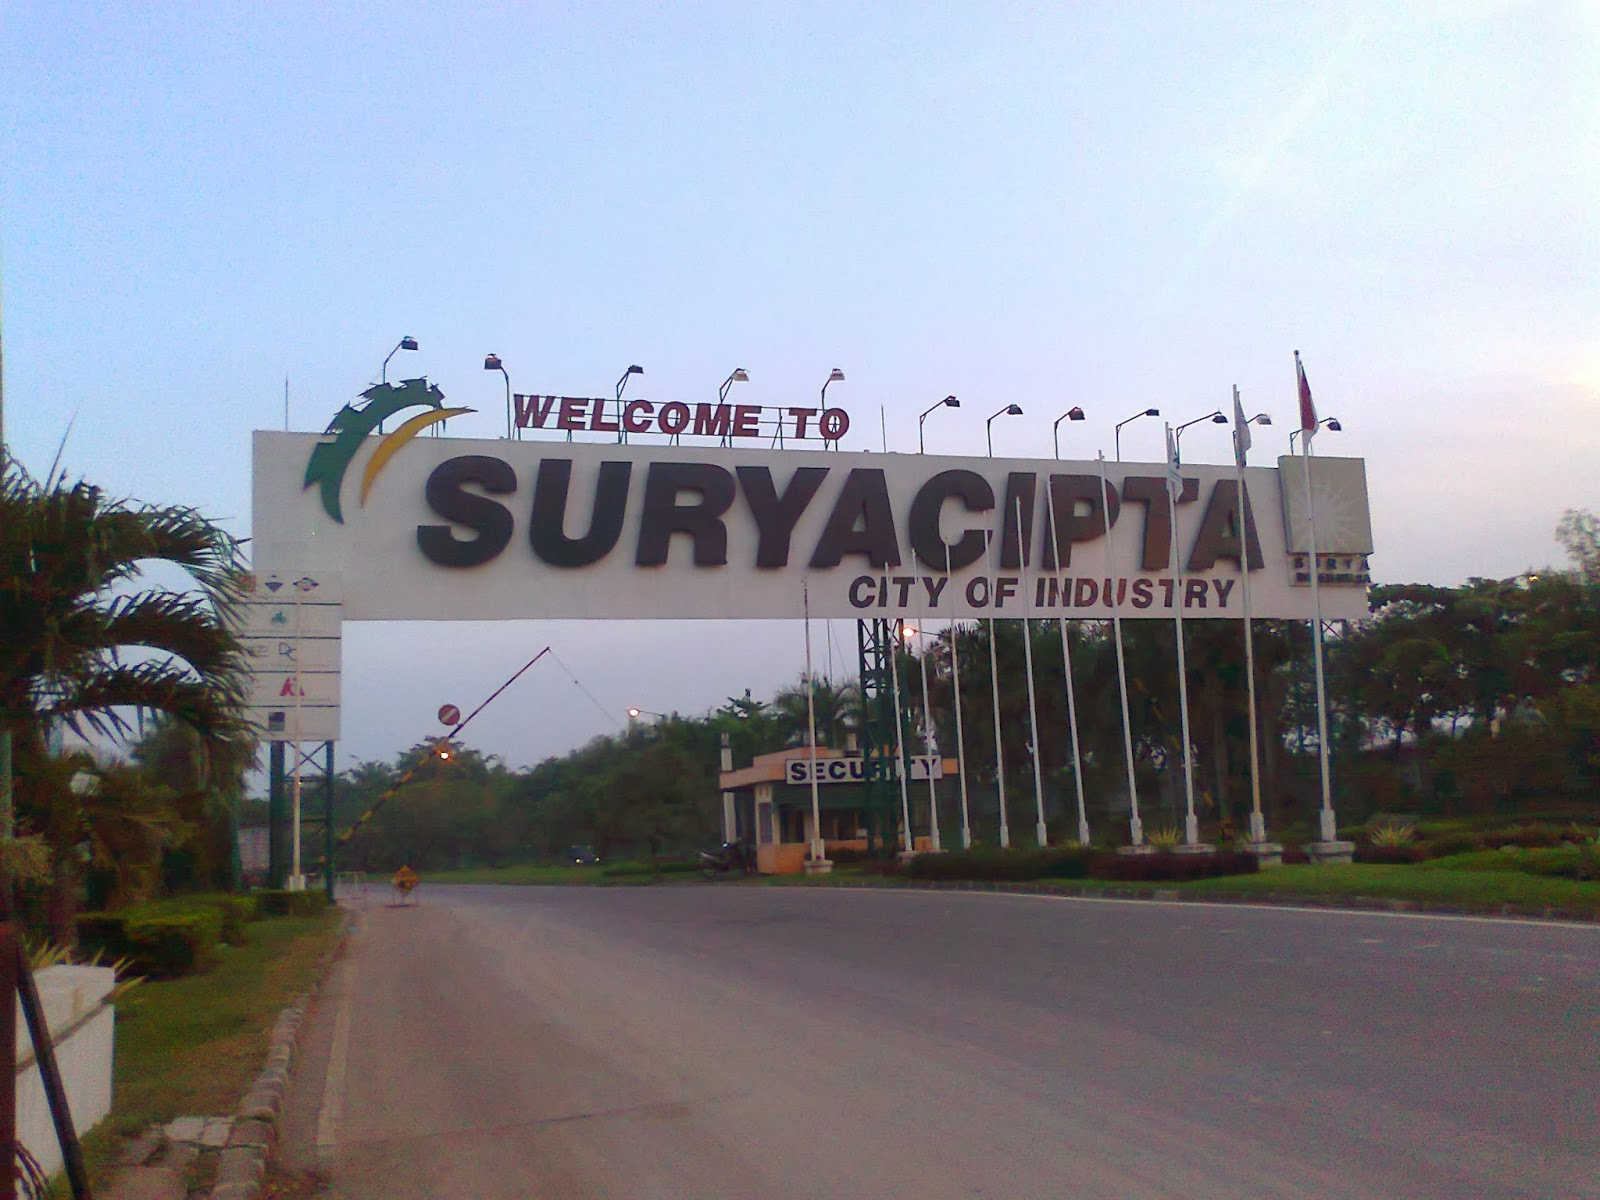 Loker Kawasan Mitra Karawang Loker Karawang Kawasan Industri Suryacipta Loker Purwasuka